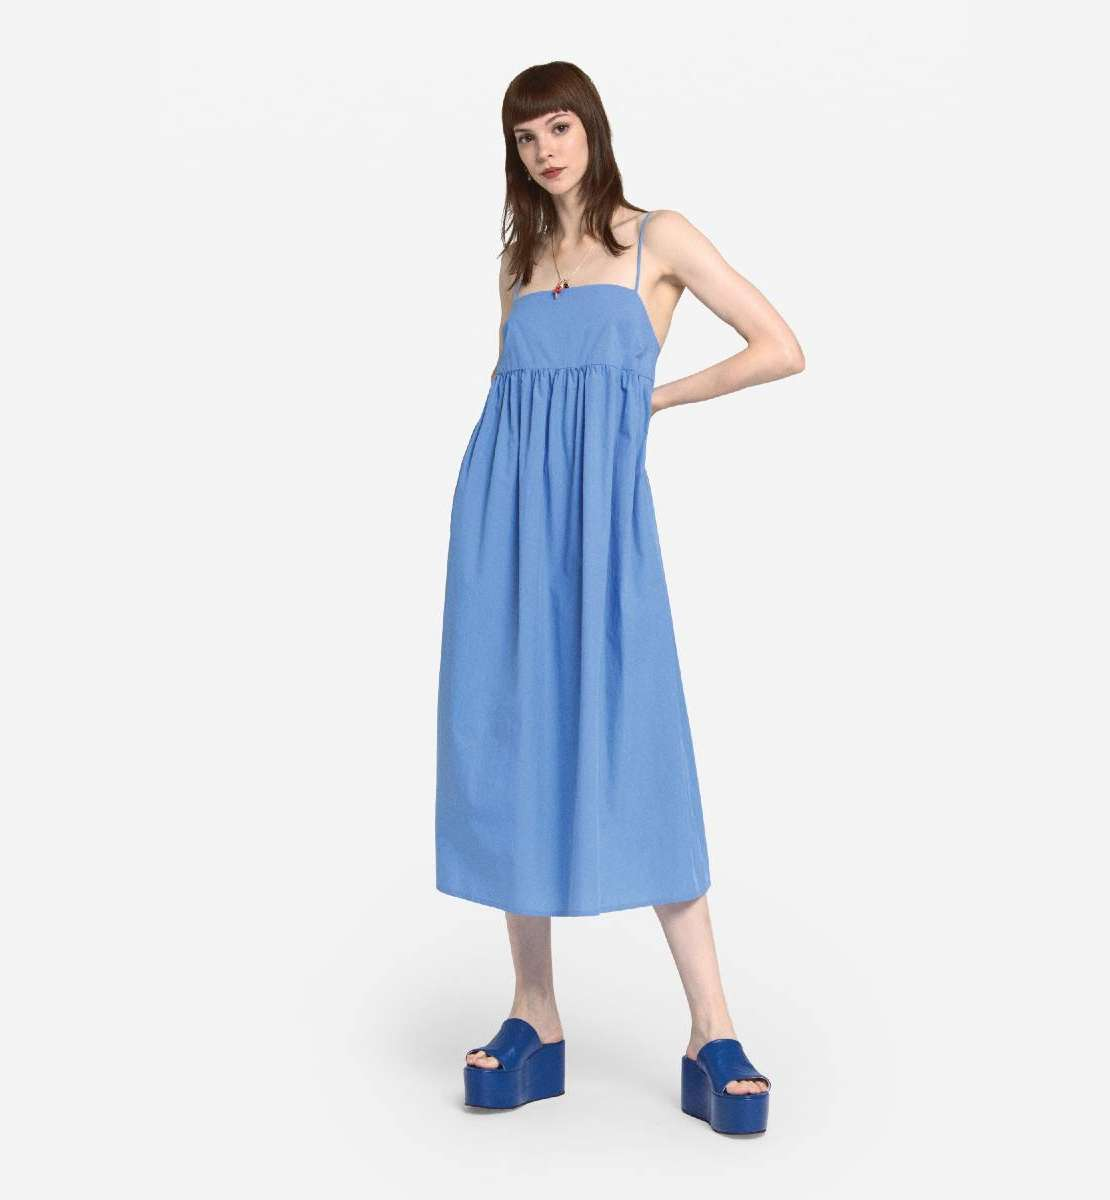 Top Summer Sale PIck at Restoration Yard - Ottod'ame Abito Dress